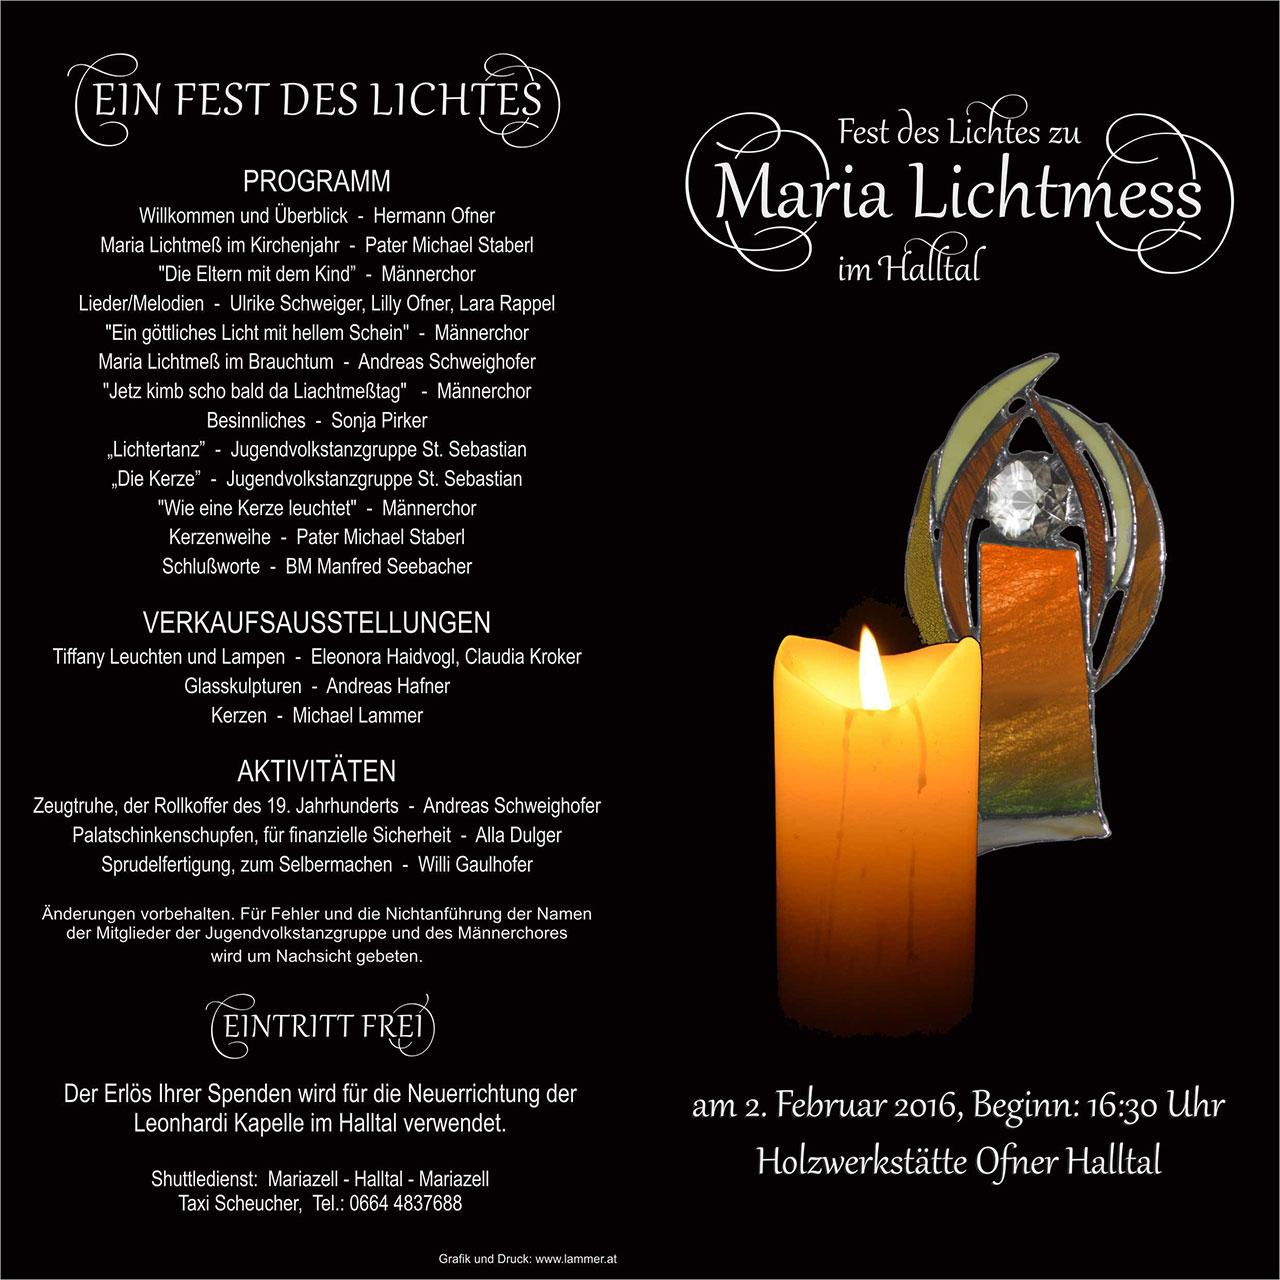 Maria-Lichtmess_Folder-4-seitig,-105x210mm,-Aussen